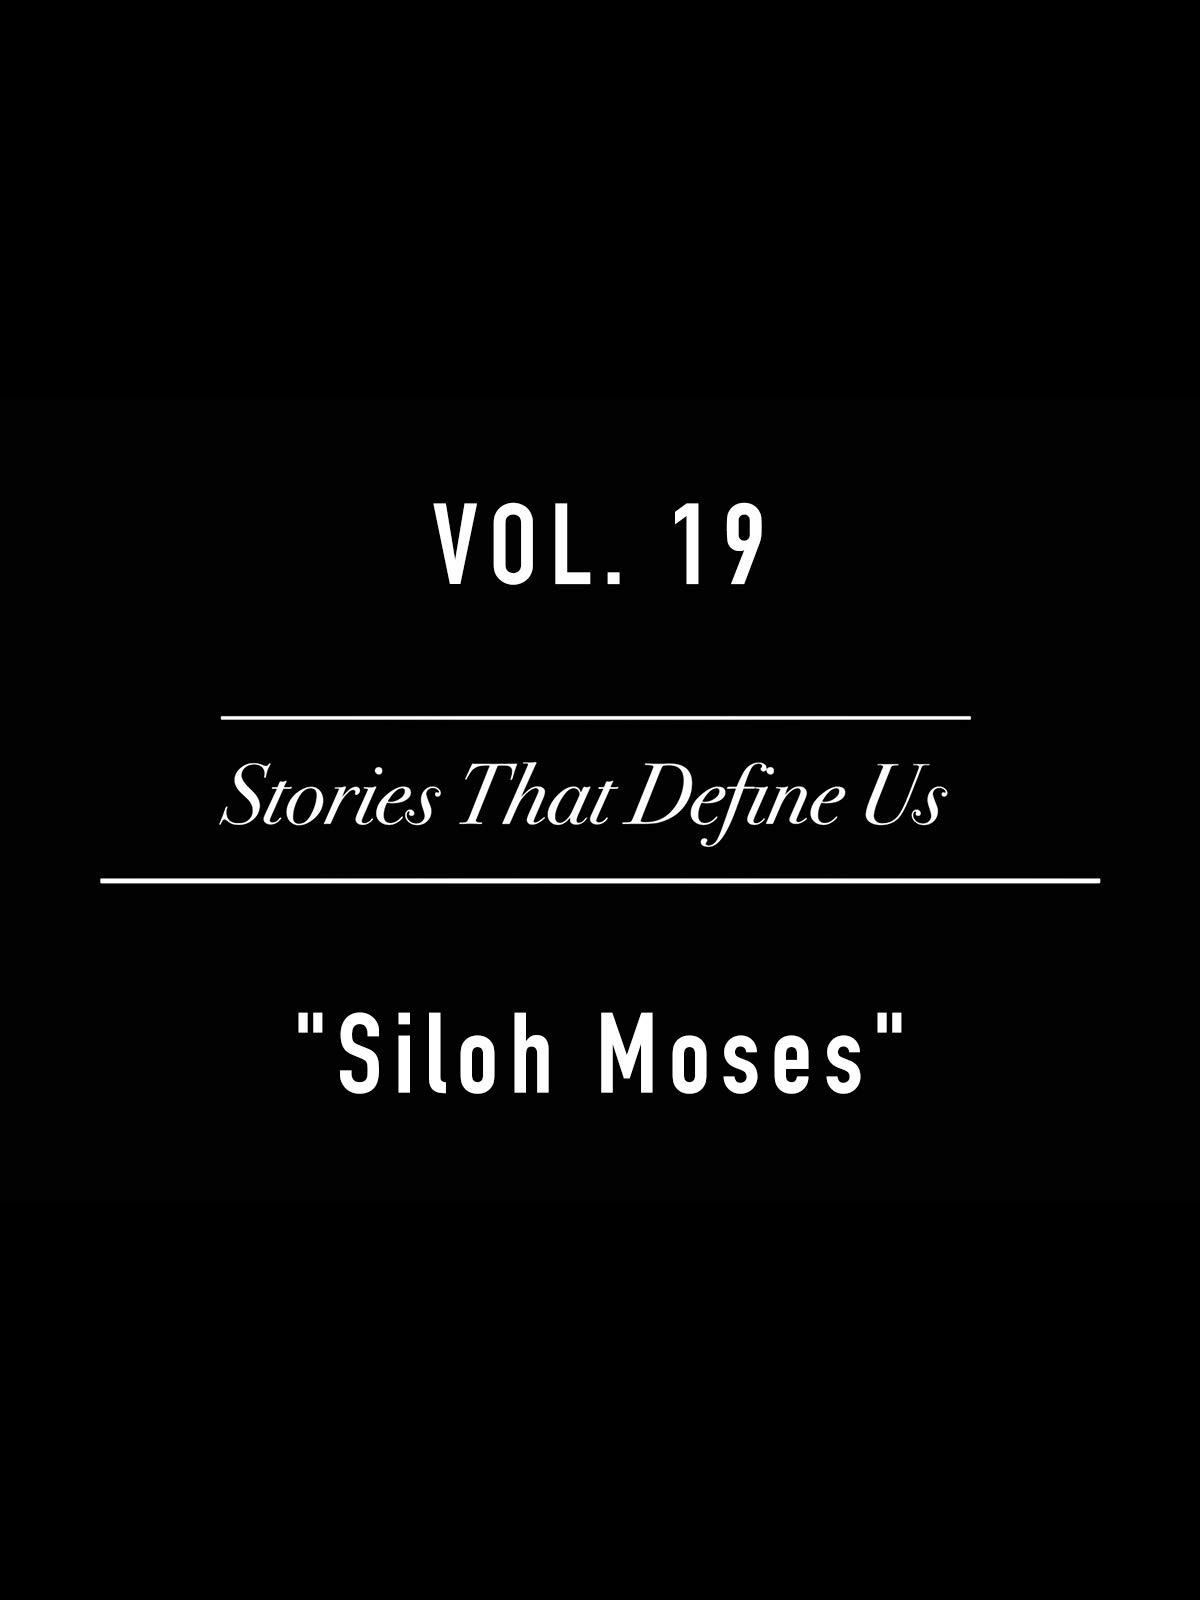 Stories That Define Us Vol. 19